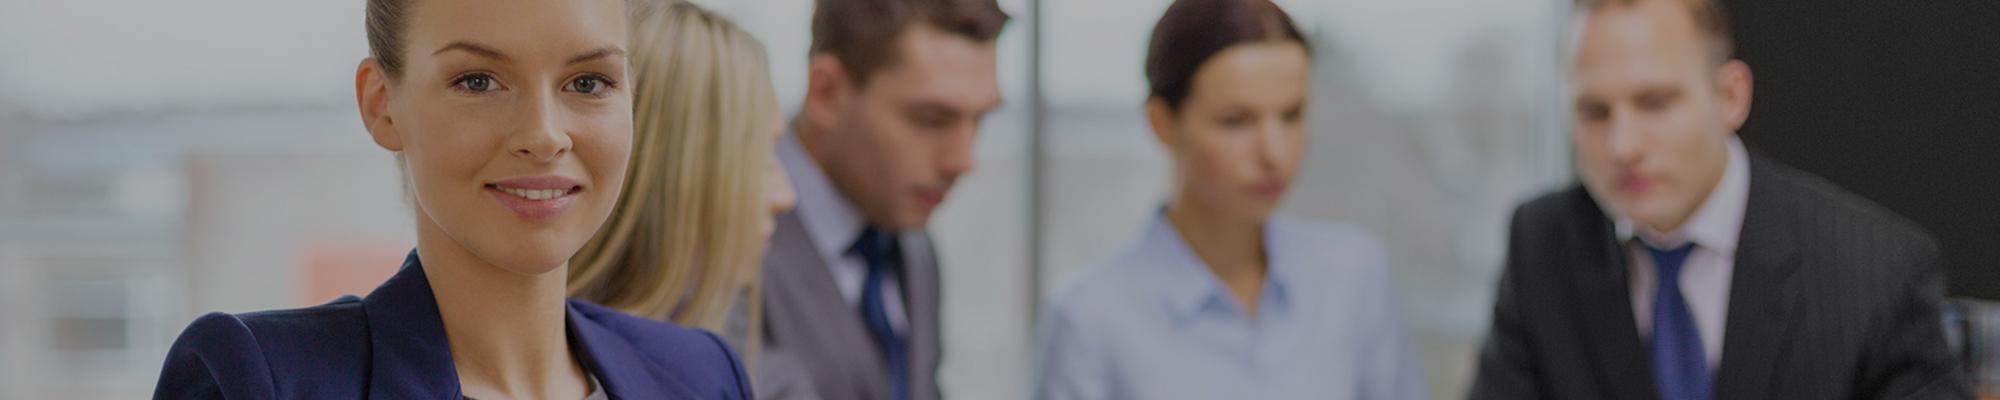 team leading management apprenticeships